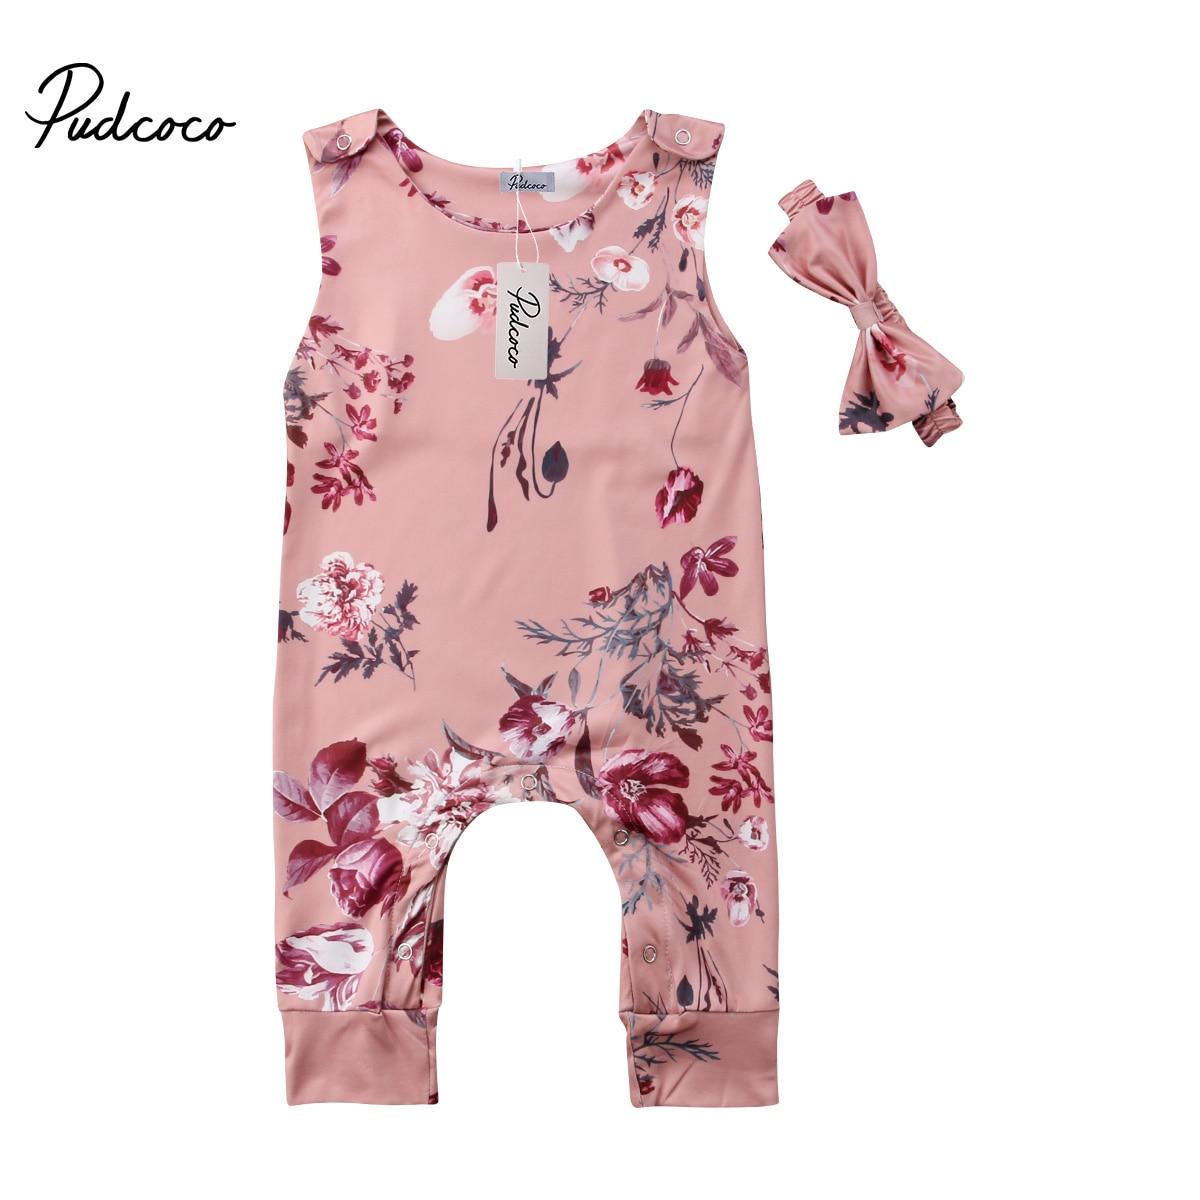 2018 Brand New Toddler Infant Newborn Kids Baby Boy Girl   Romper   Headband 2Pcs Sets Sleeveless Jumpsuit Children Summer Clothing